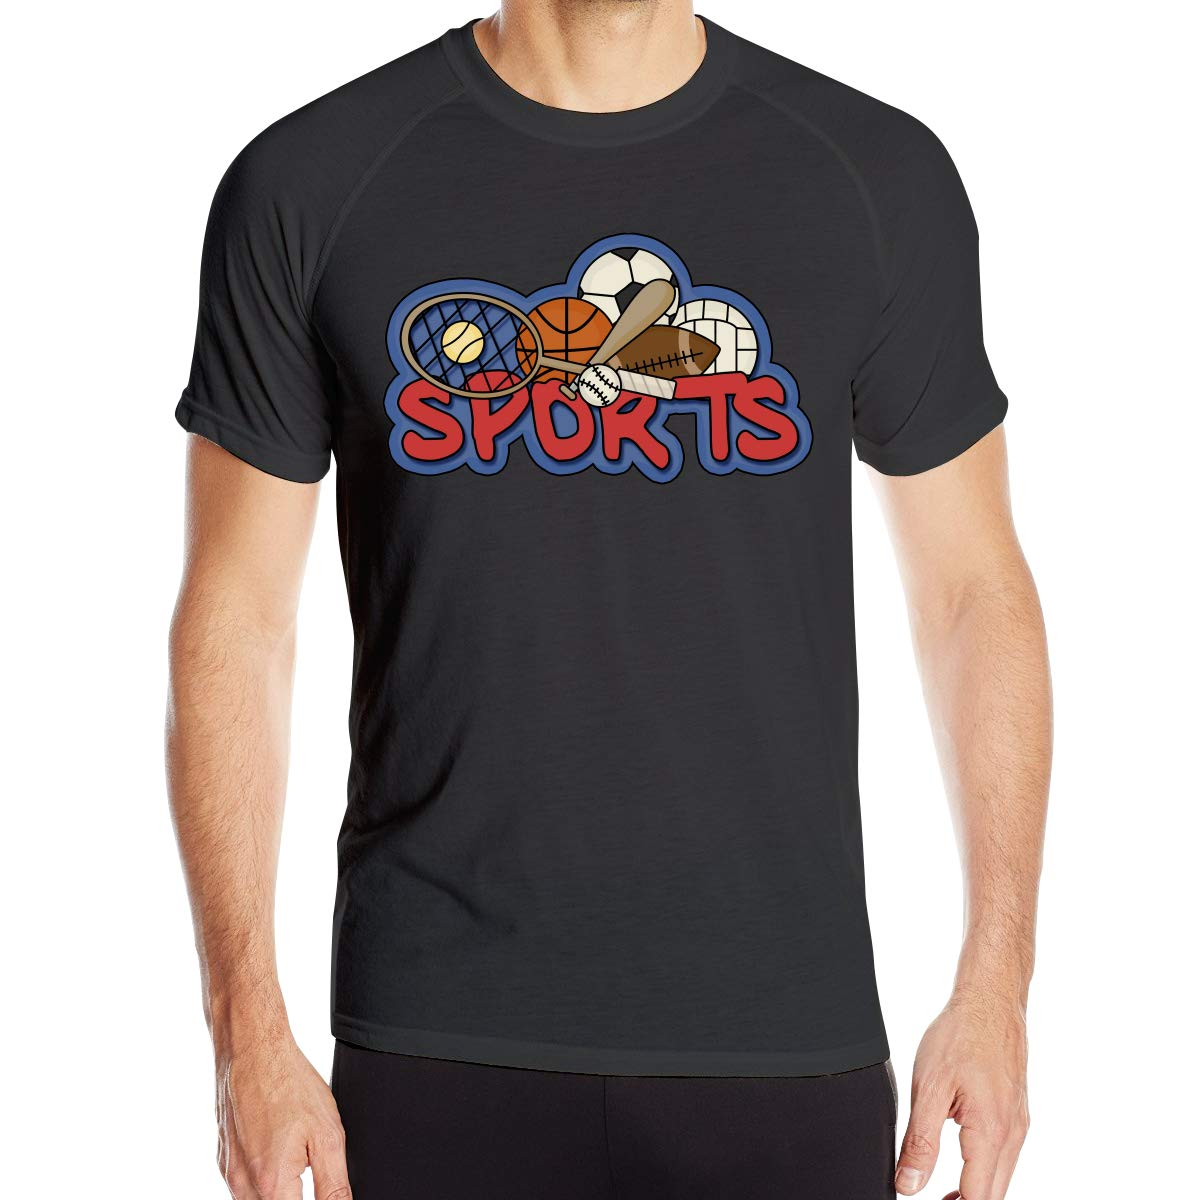 XueDaoStore Sports Men Fast Drying Round Collar Shirt T-Shirt Basic Short Sleeve Gym T-Shirt